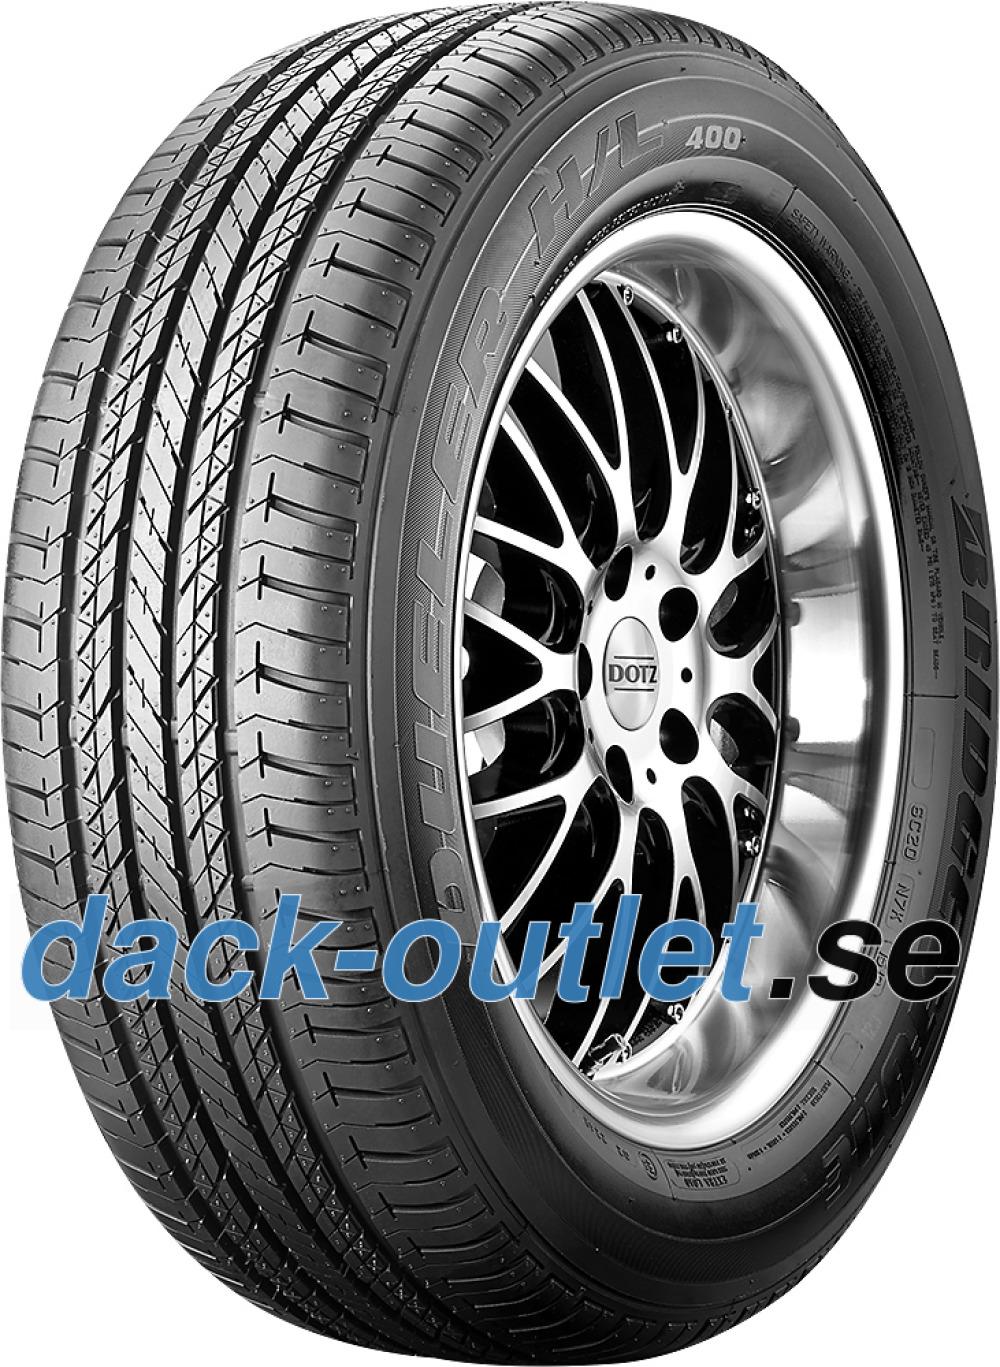 Bridgestone Dueler H/L 400 RFT ( 255/50 R19 107H XL *, med fälg skyddslist (MFS), runflat )